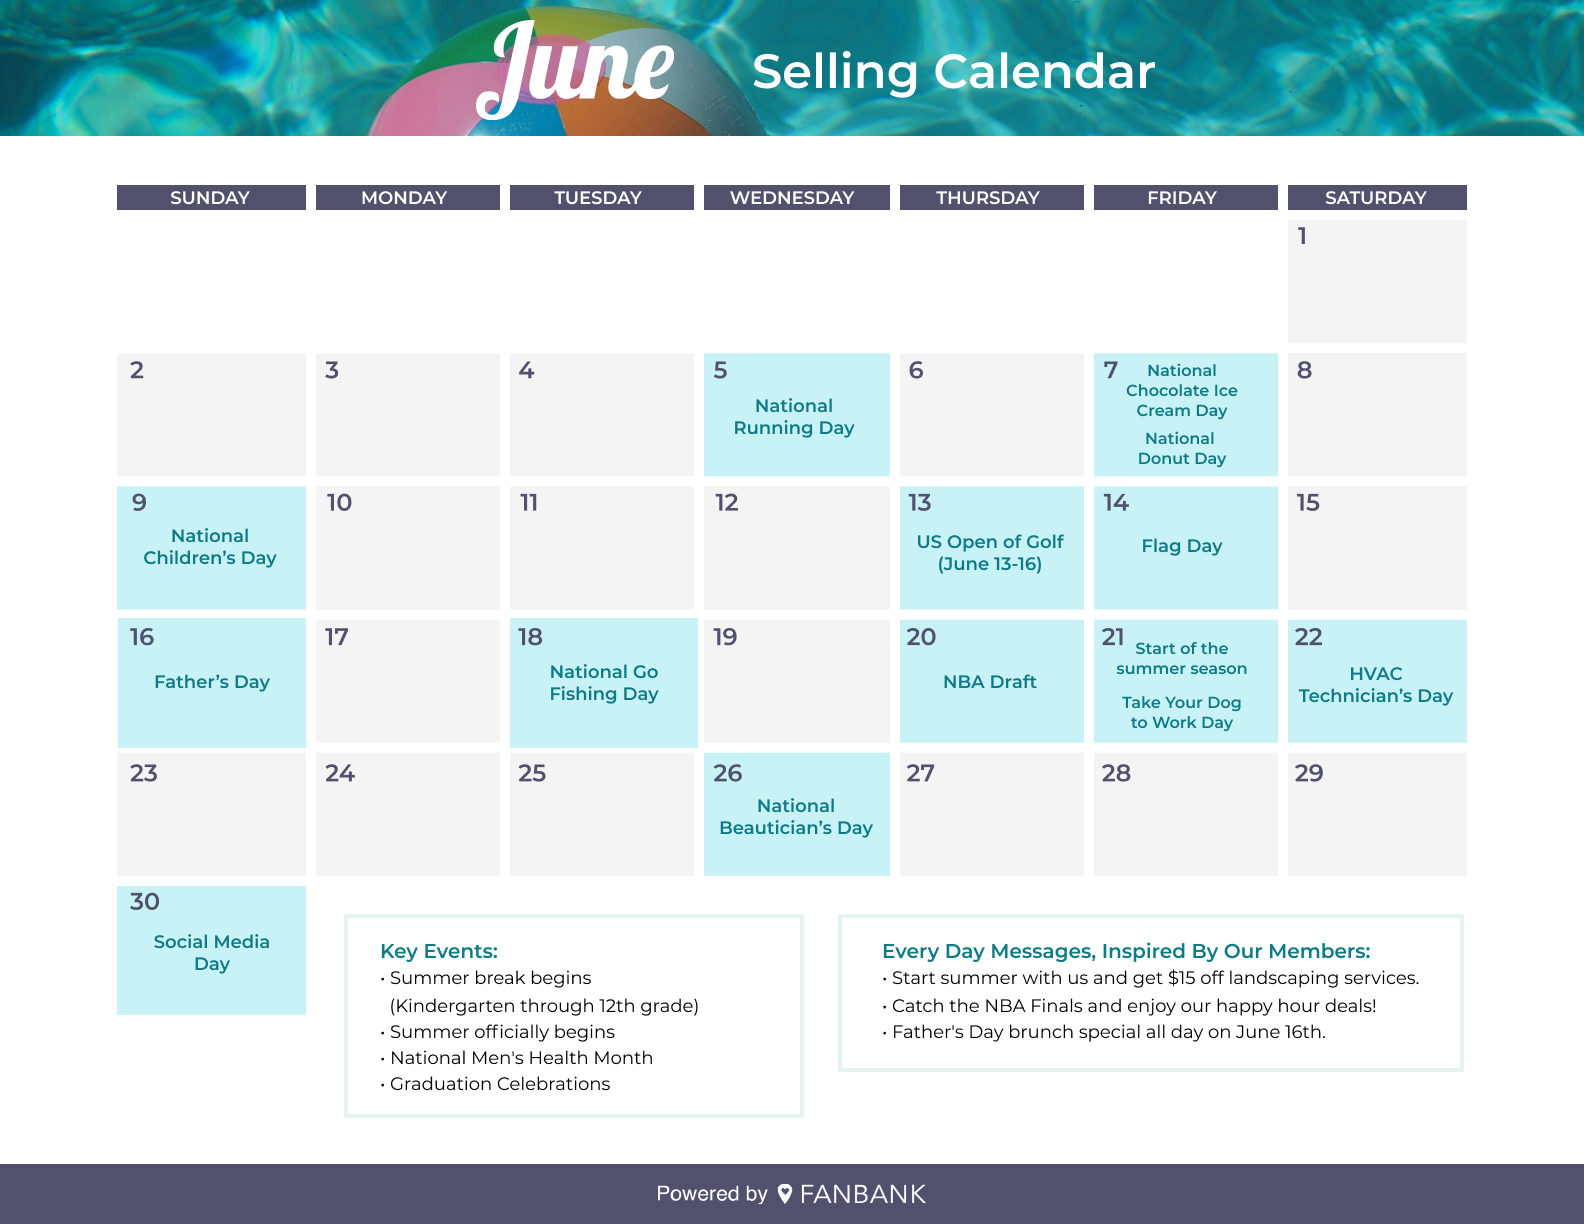 Fanbank June events calendar